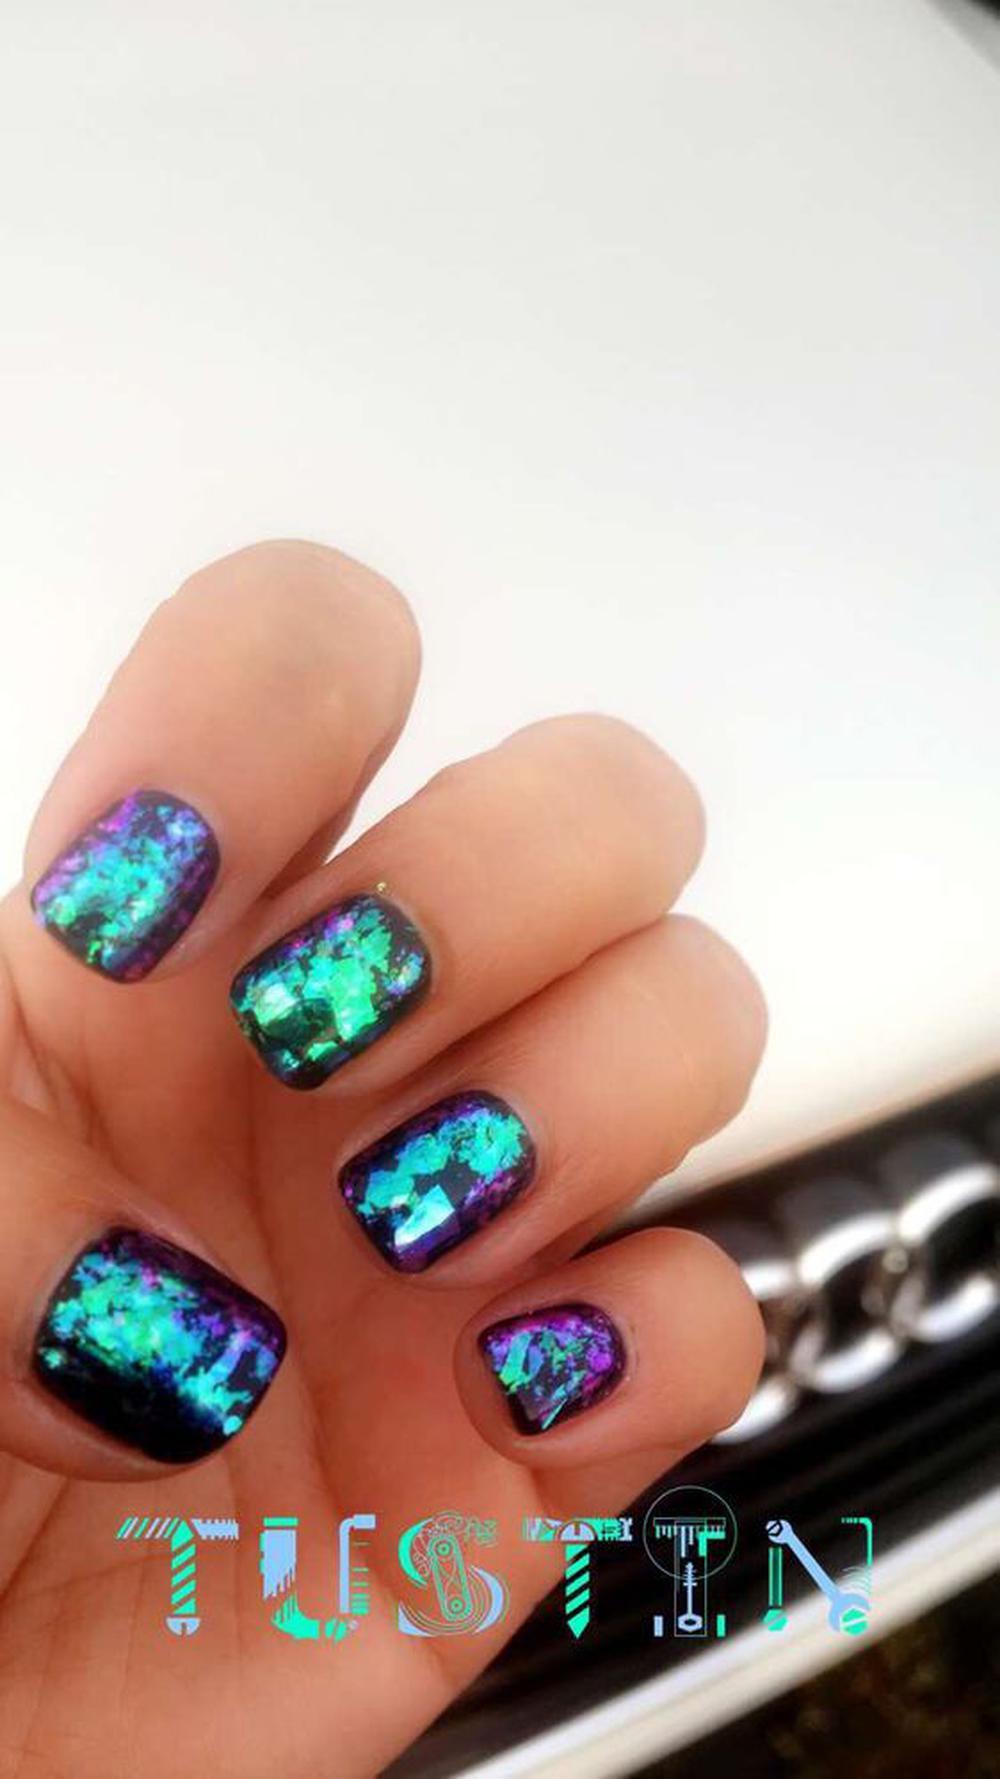 K K Nails & Spa